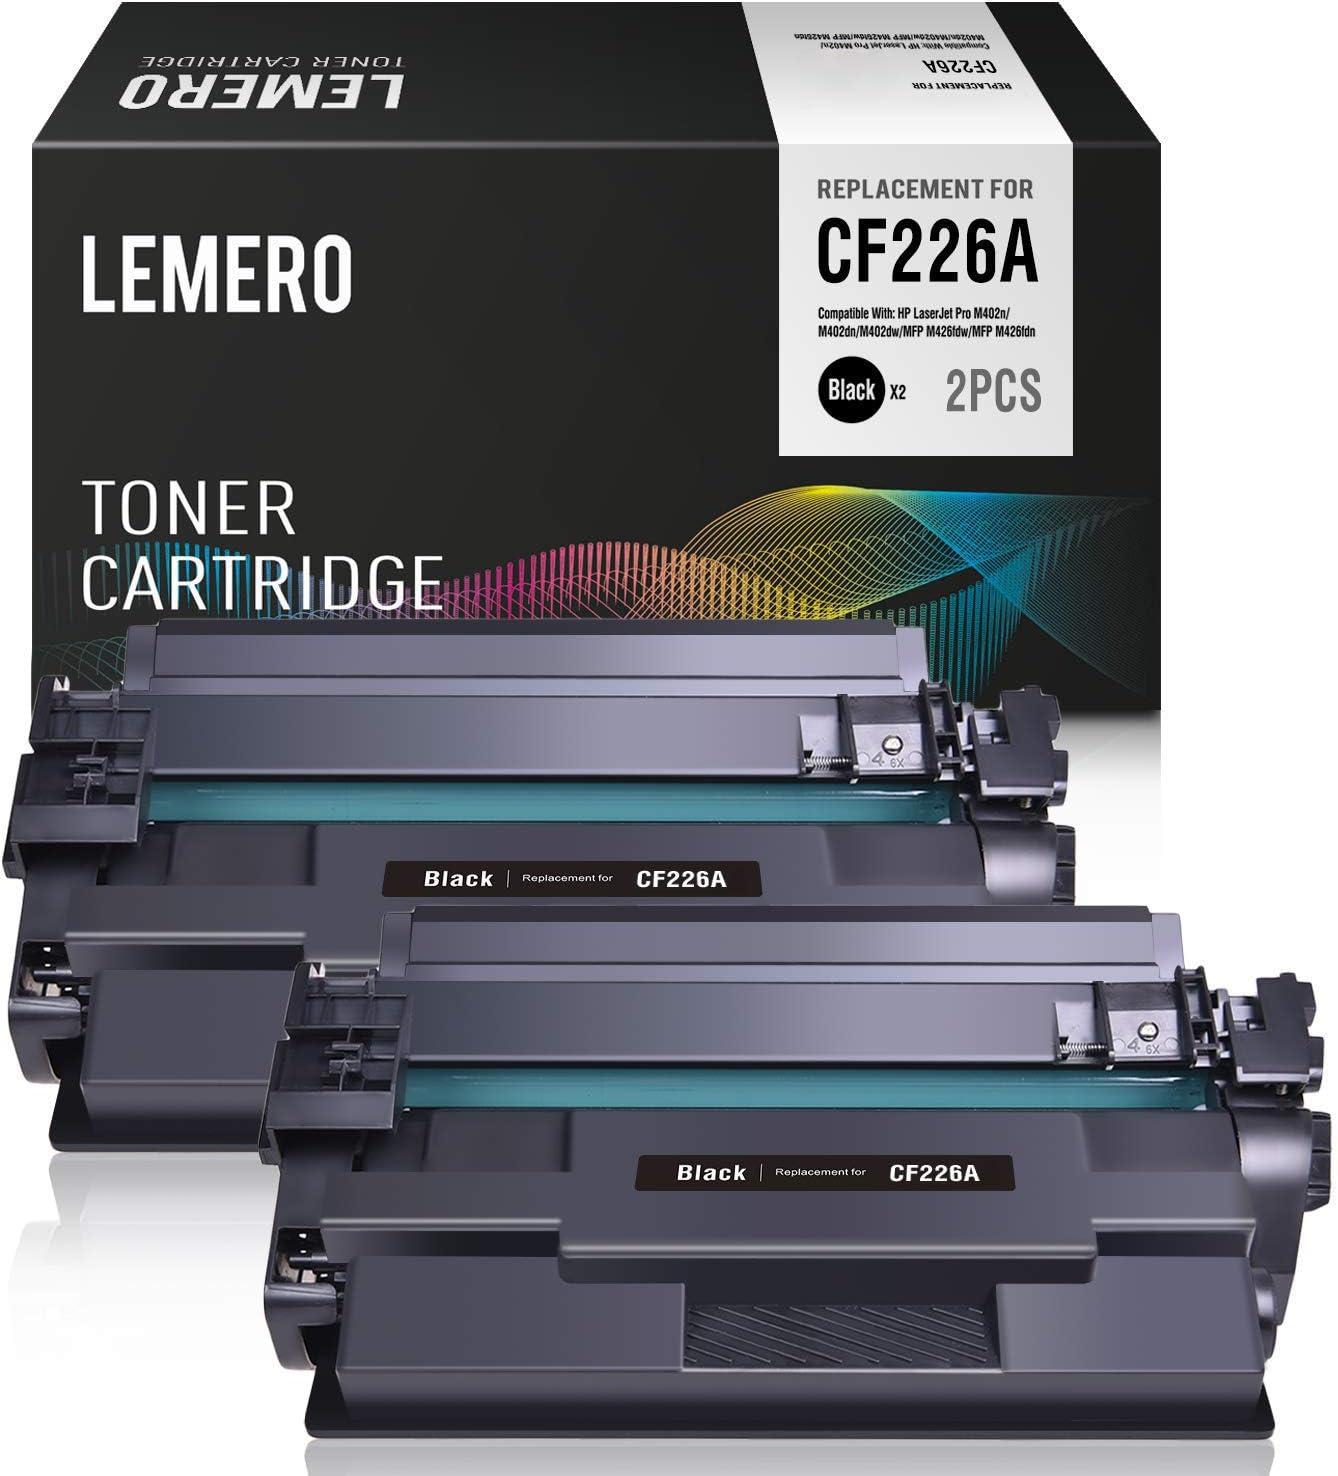 LEMERO Compatible Toner Cartridge Replacement for HP 26A CF226A for Laserjet Pro M402n M402dn M402dw Laserjet Pro MFP M426fdw MFP M426fdn Series Printer 2 Pack (Black)